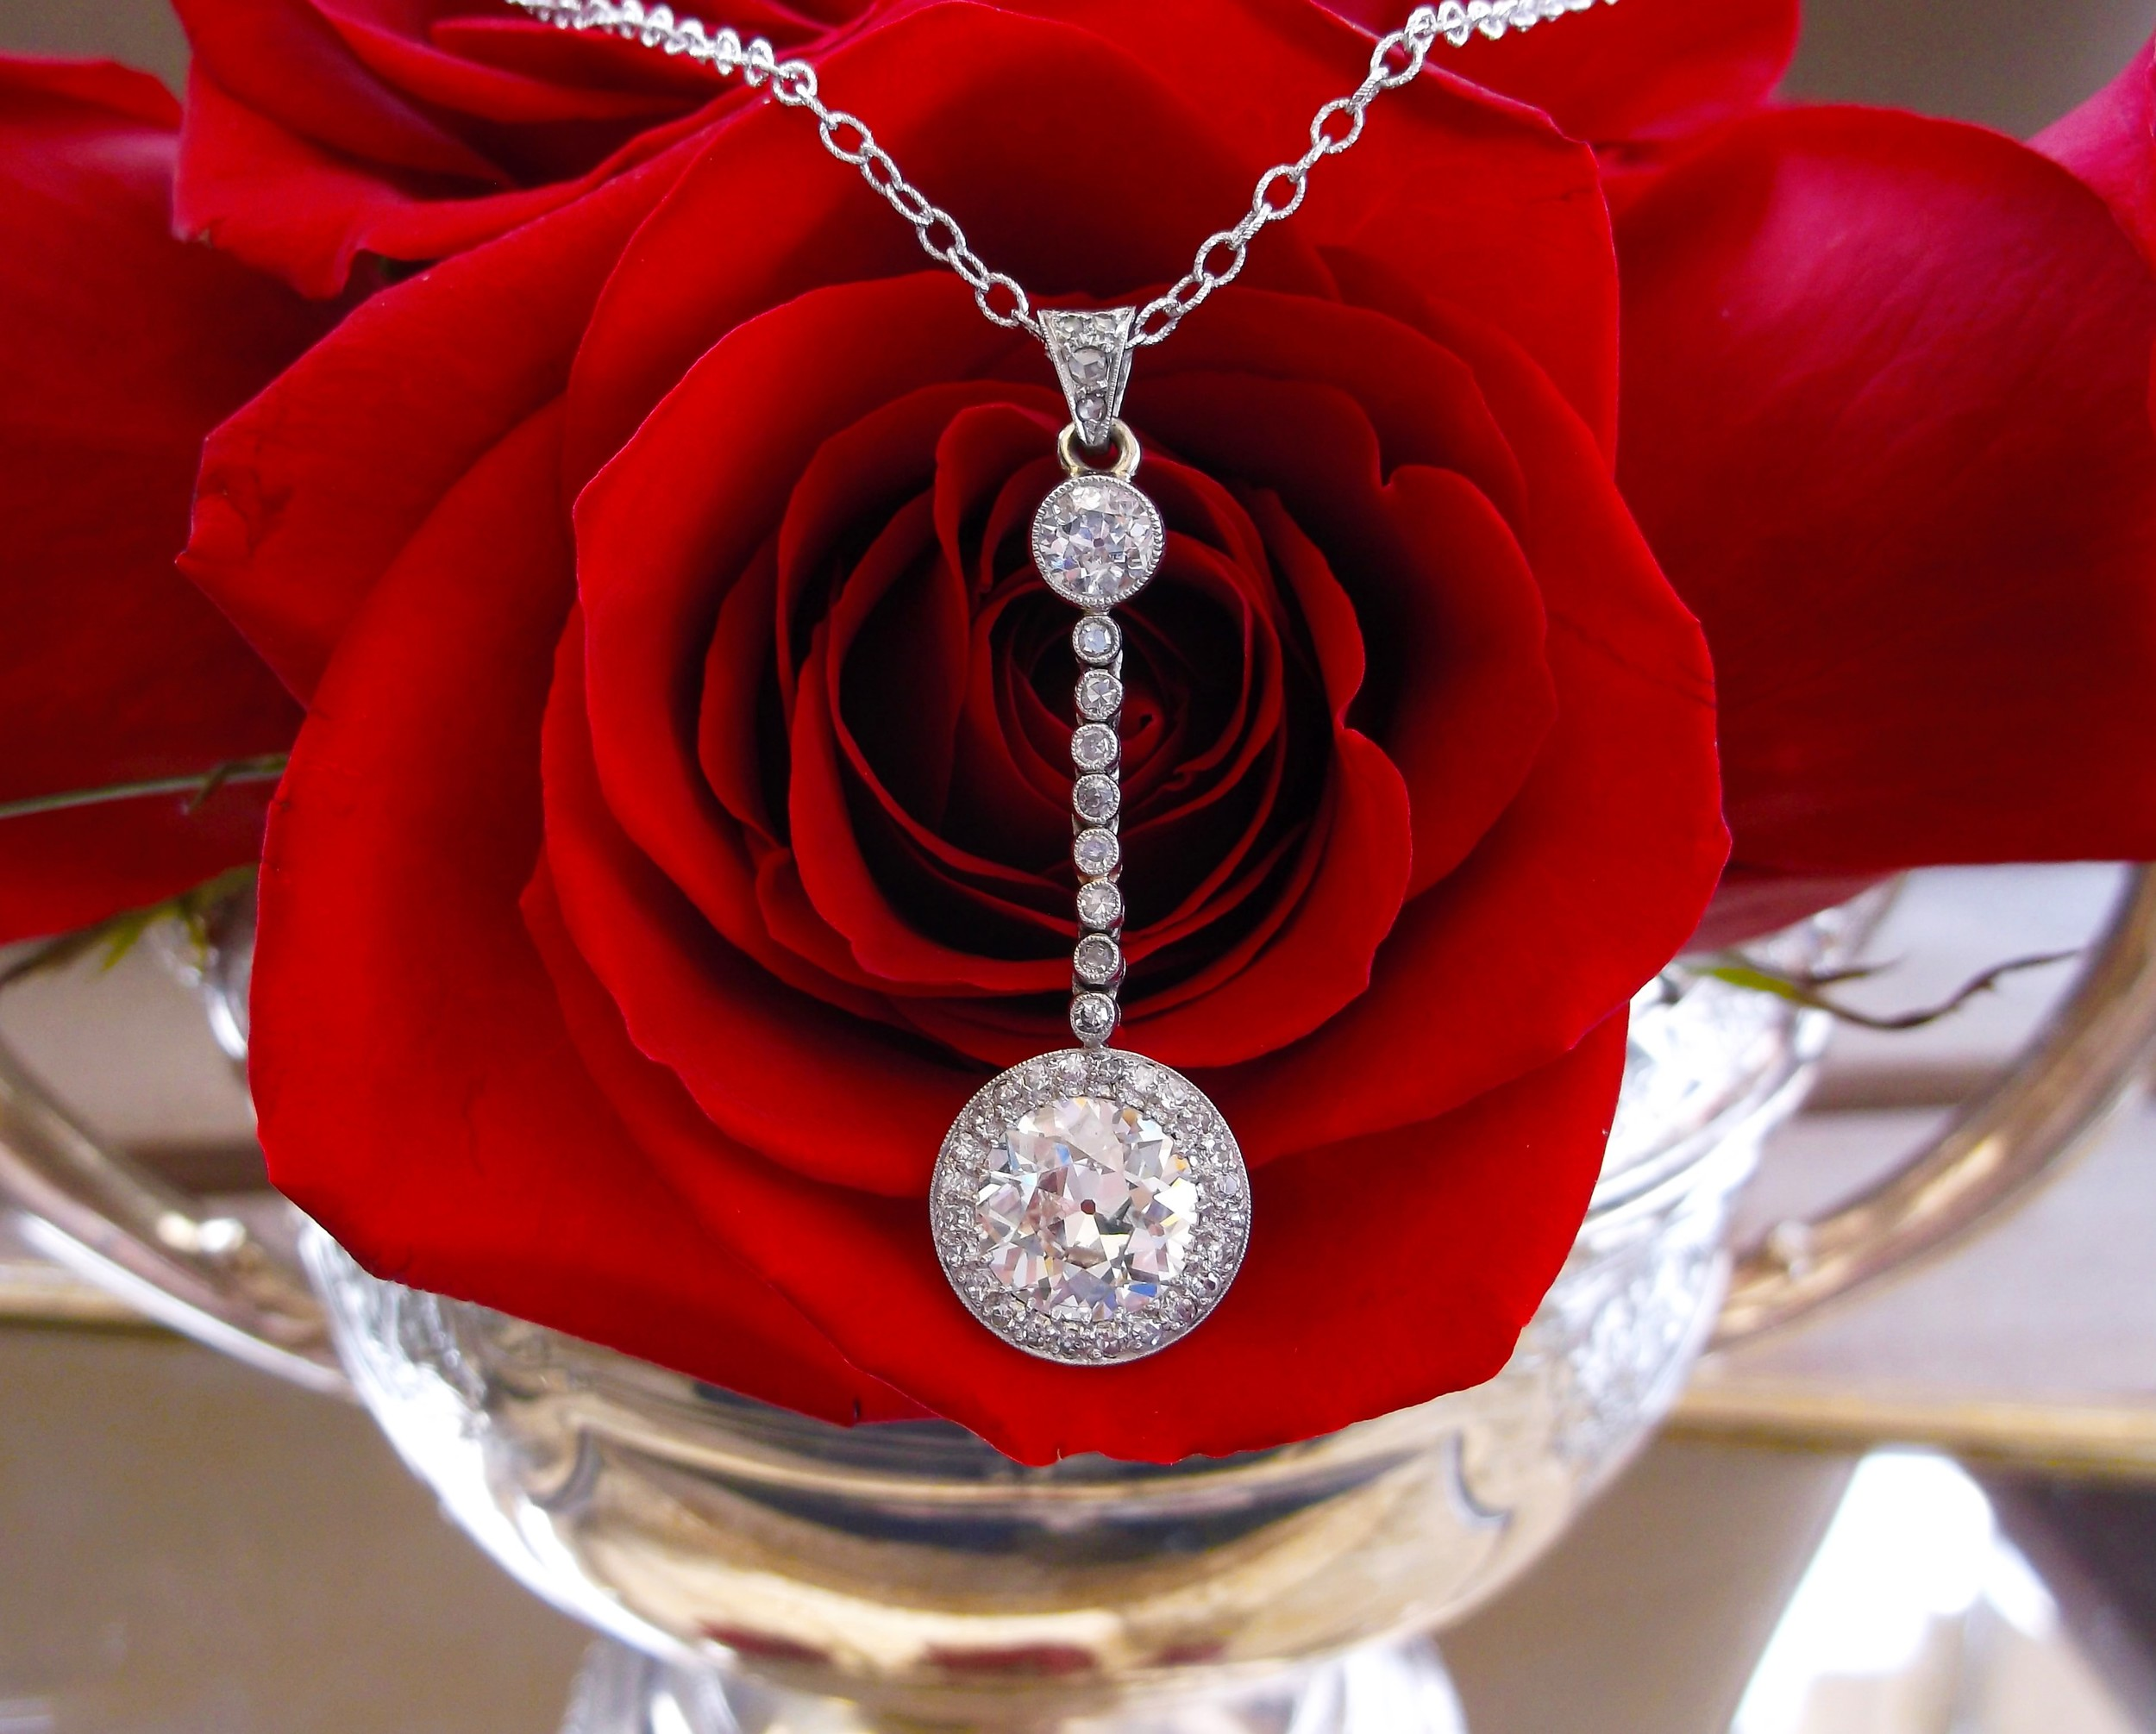 SOLD - Breathtaking 1920's 2.42 carat Old European cut diamond set in a gorgeous platinum and diamond pendant.